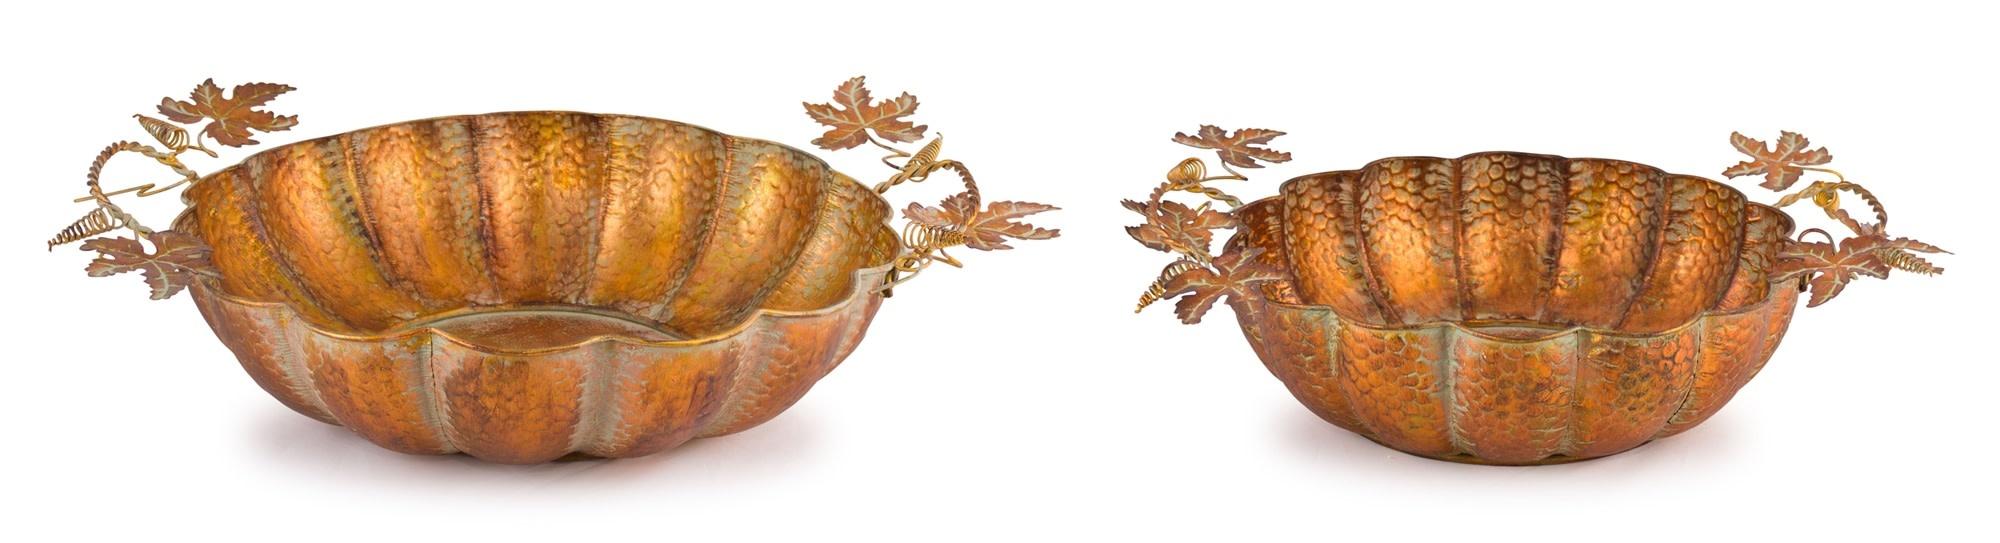 Distressed Copper Pumpkin Bowl (2-Sizes)